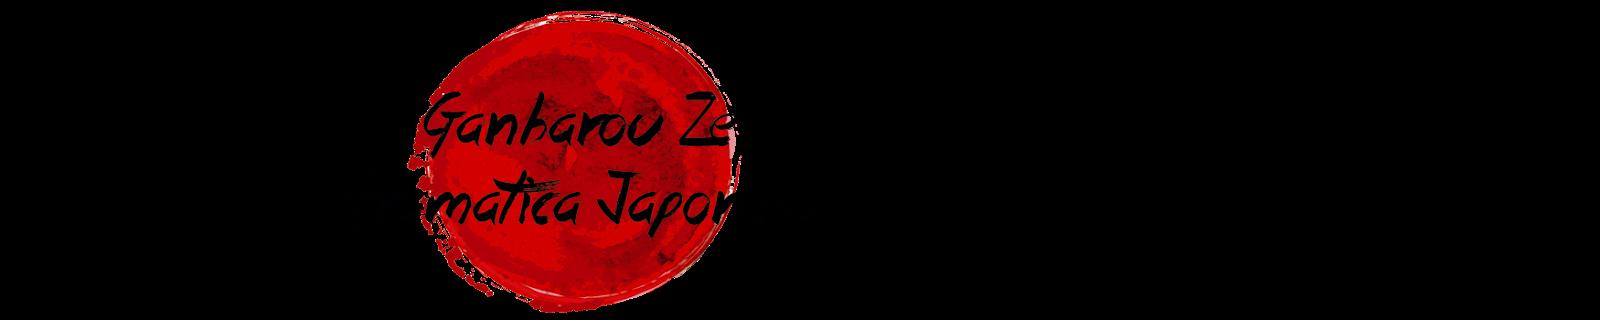 Ganbarou Ze! - Gramática Japonesa